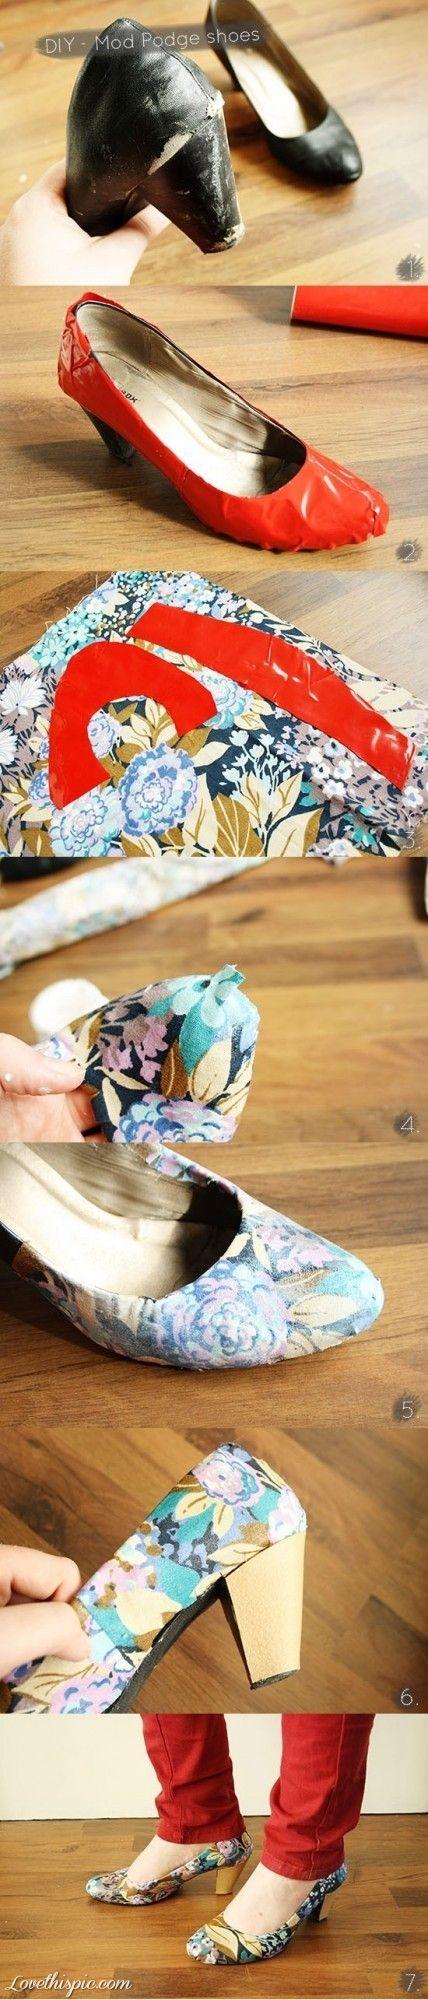 Redo Old Shoes with Fabric crafts craft ideas easy crafts diy ideas diy clothes easy diy diy fashion diy shoes craft clothes fashion diy